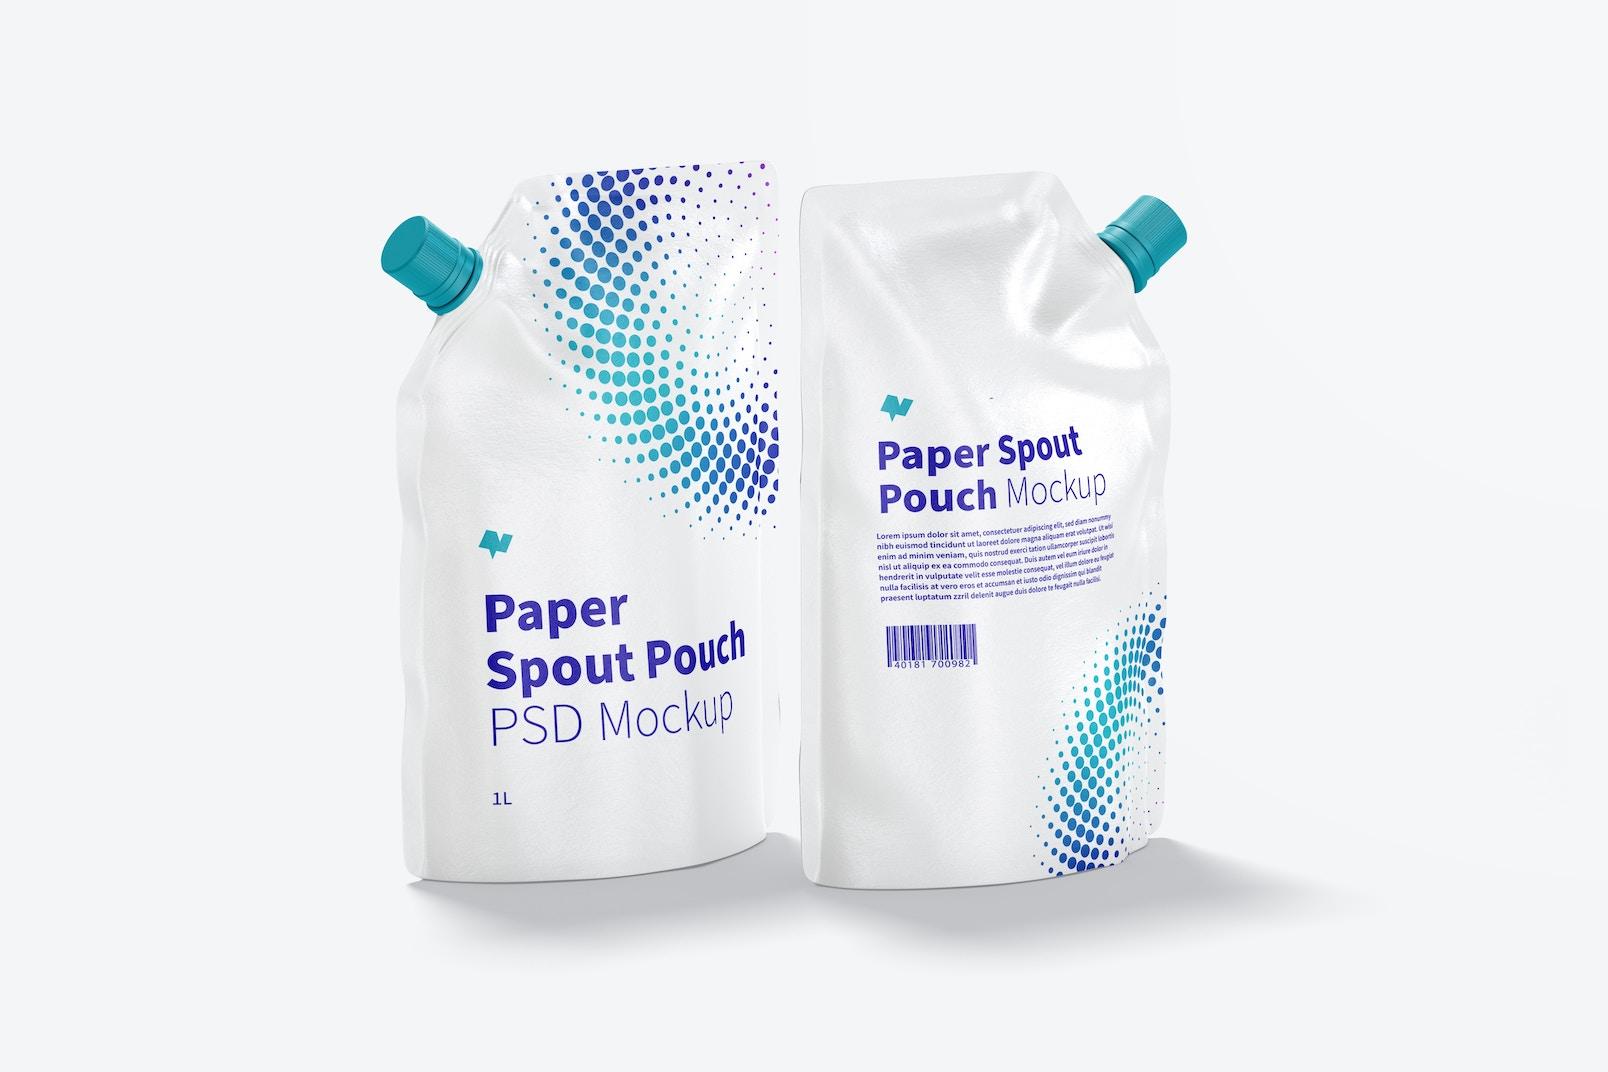 1 Liter Paper Spout Pouch Mockup